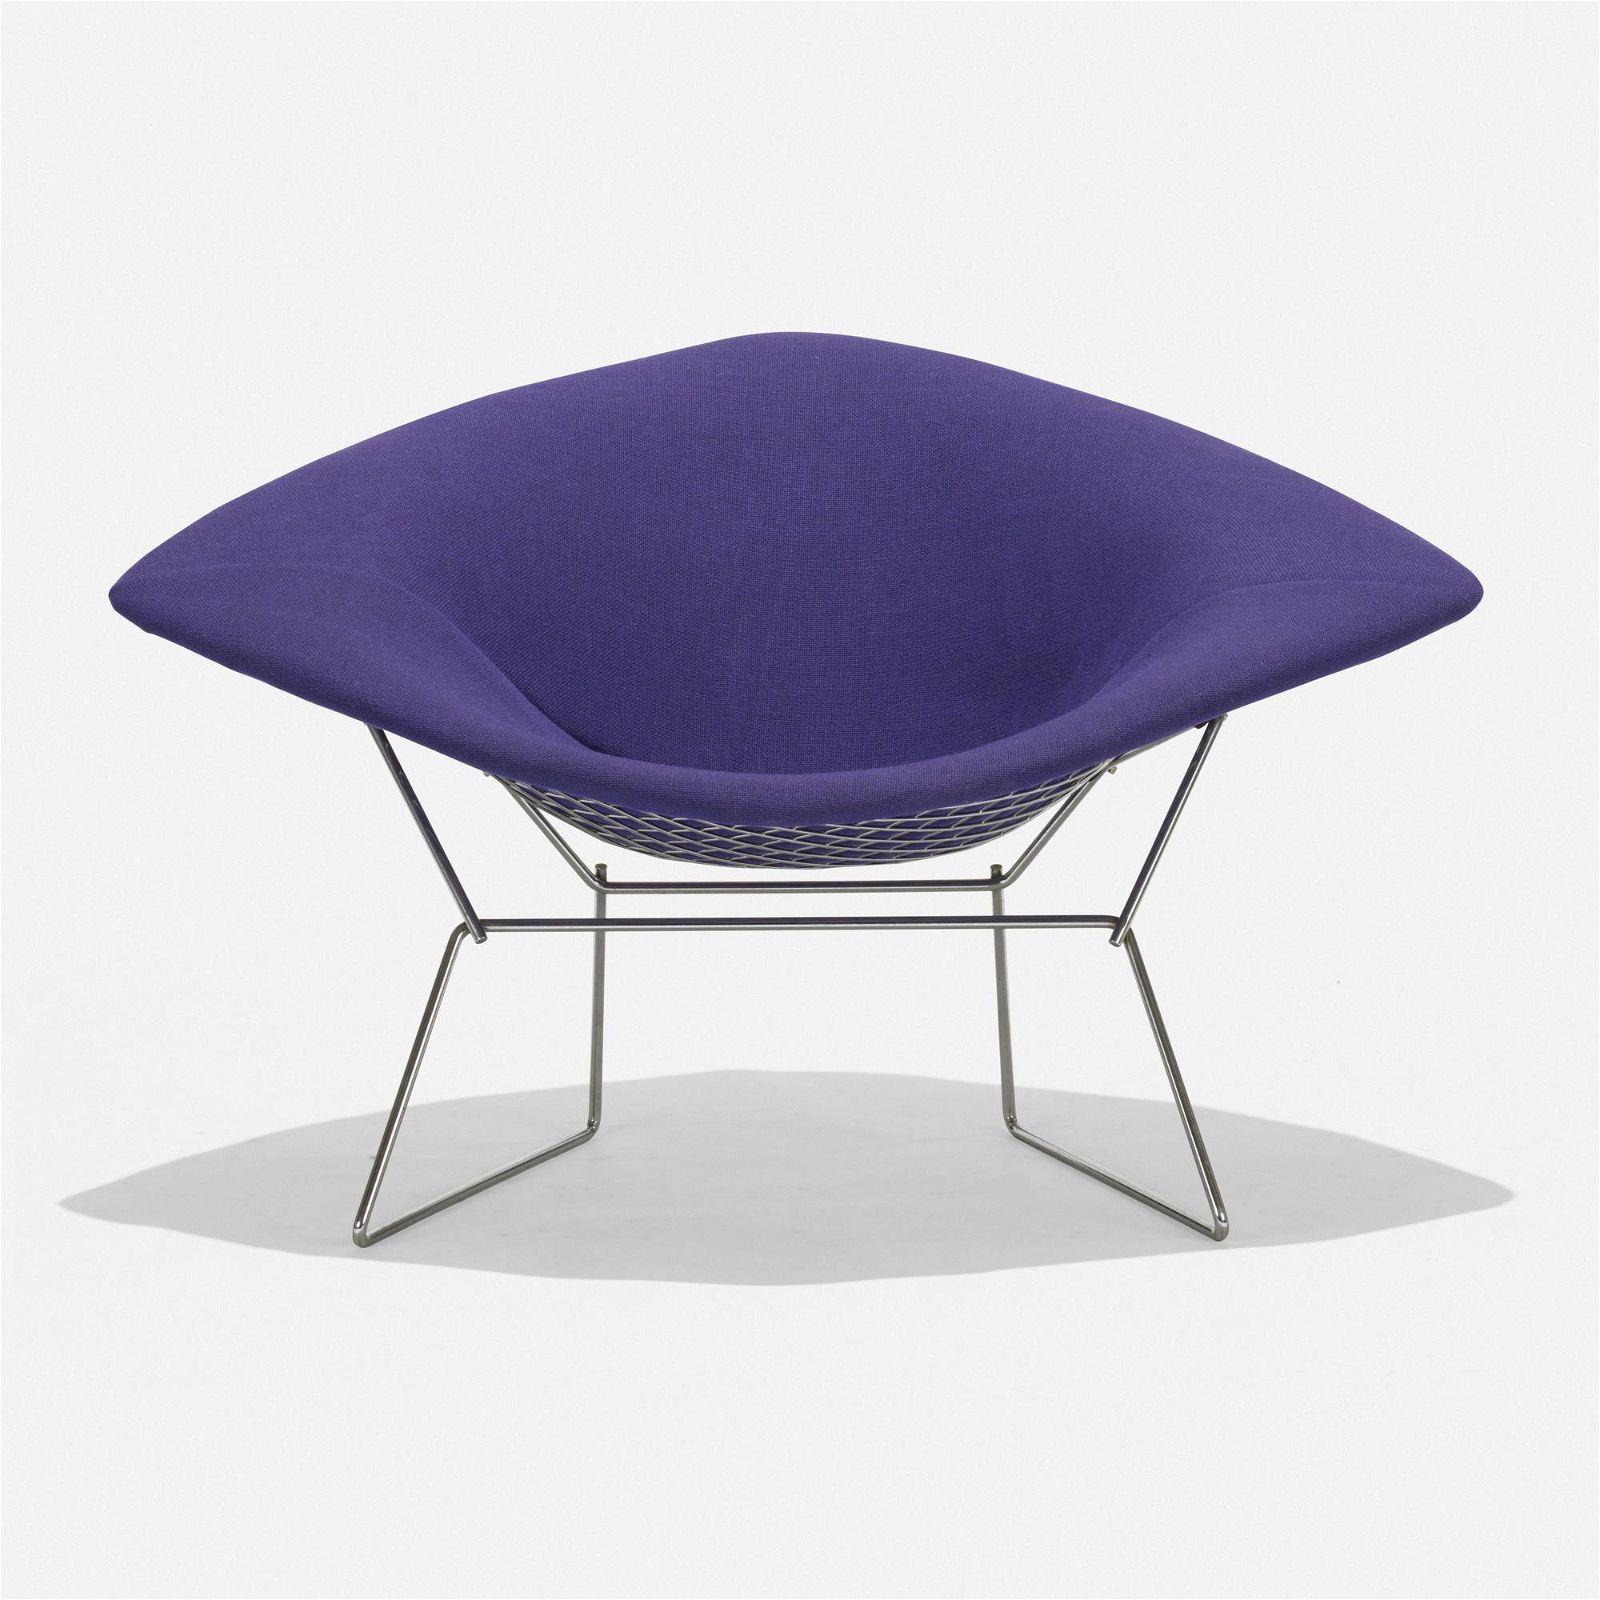 Harry Bertoia, Wide Diamond chair